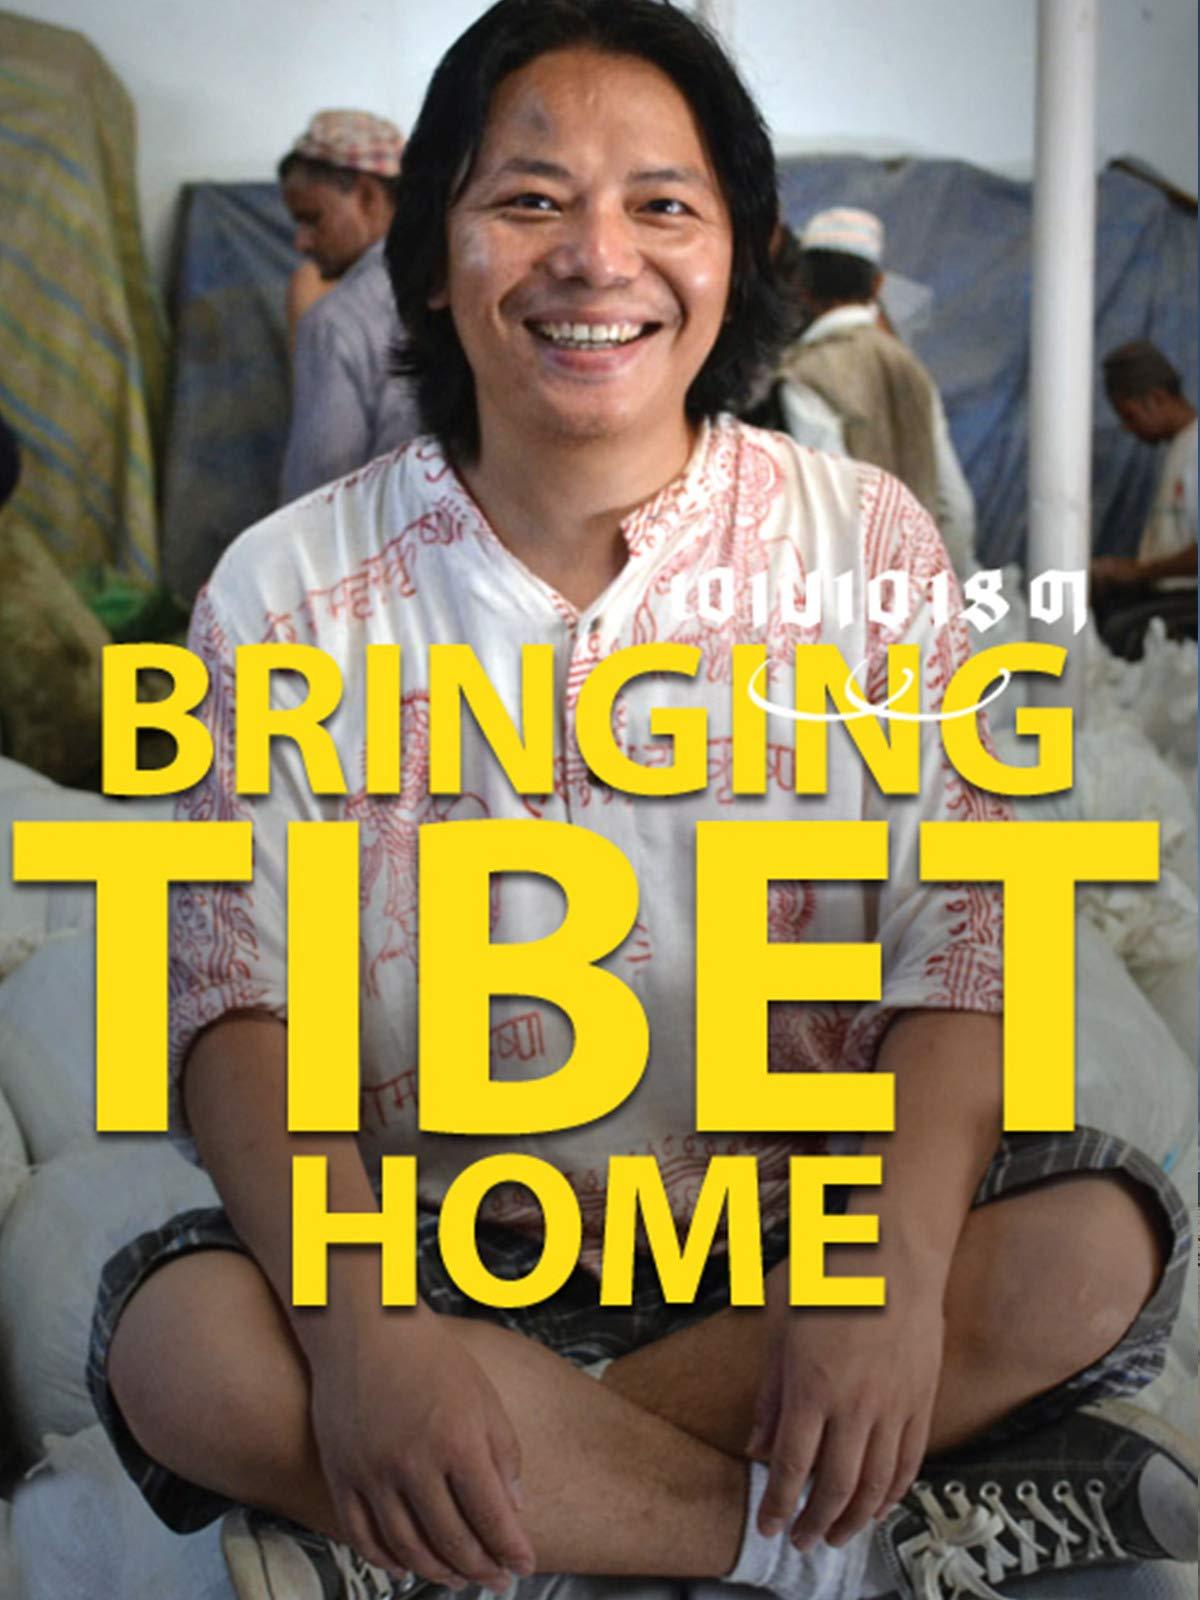 Bringing Tibet Home